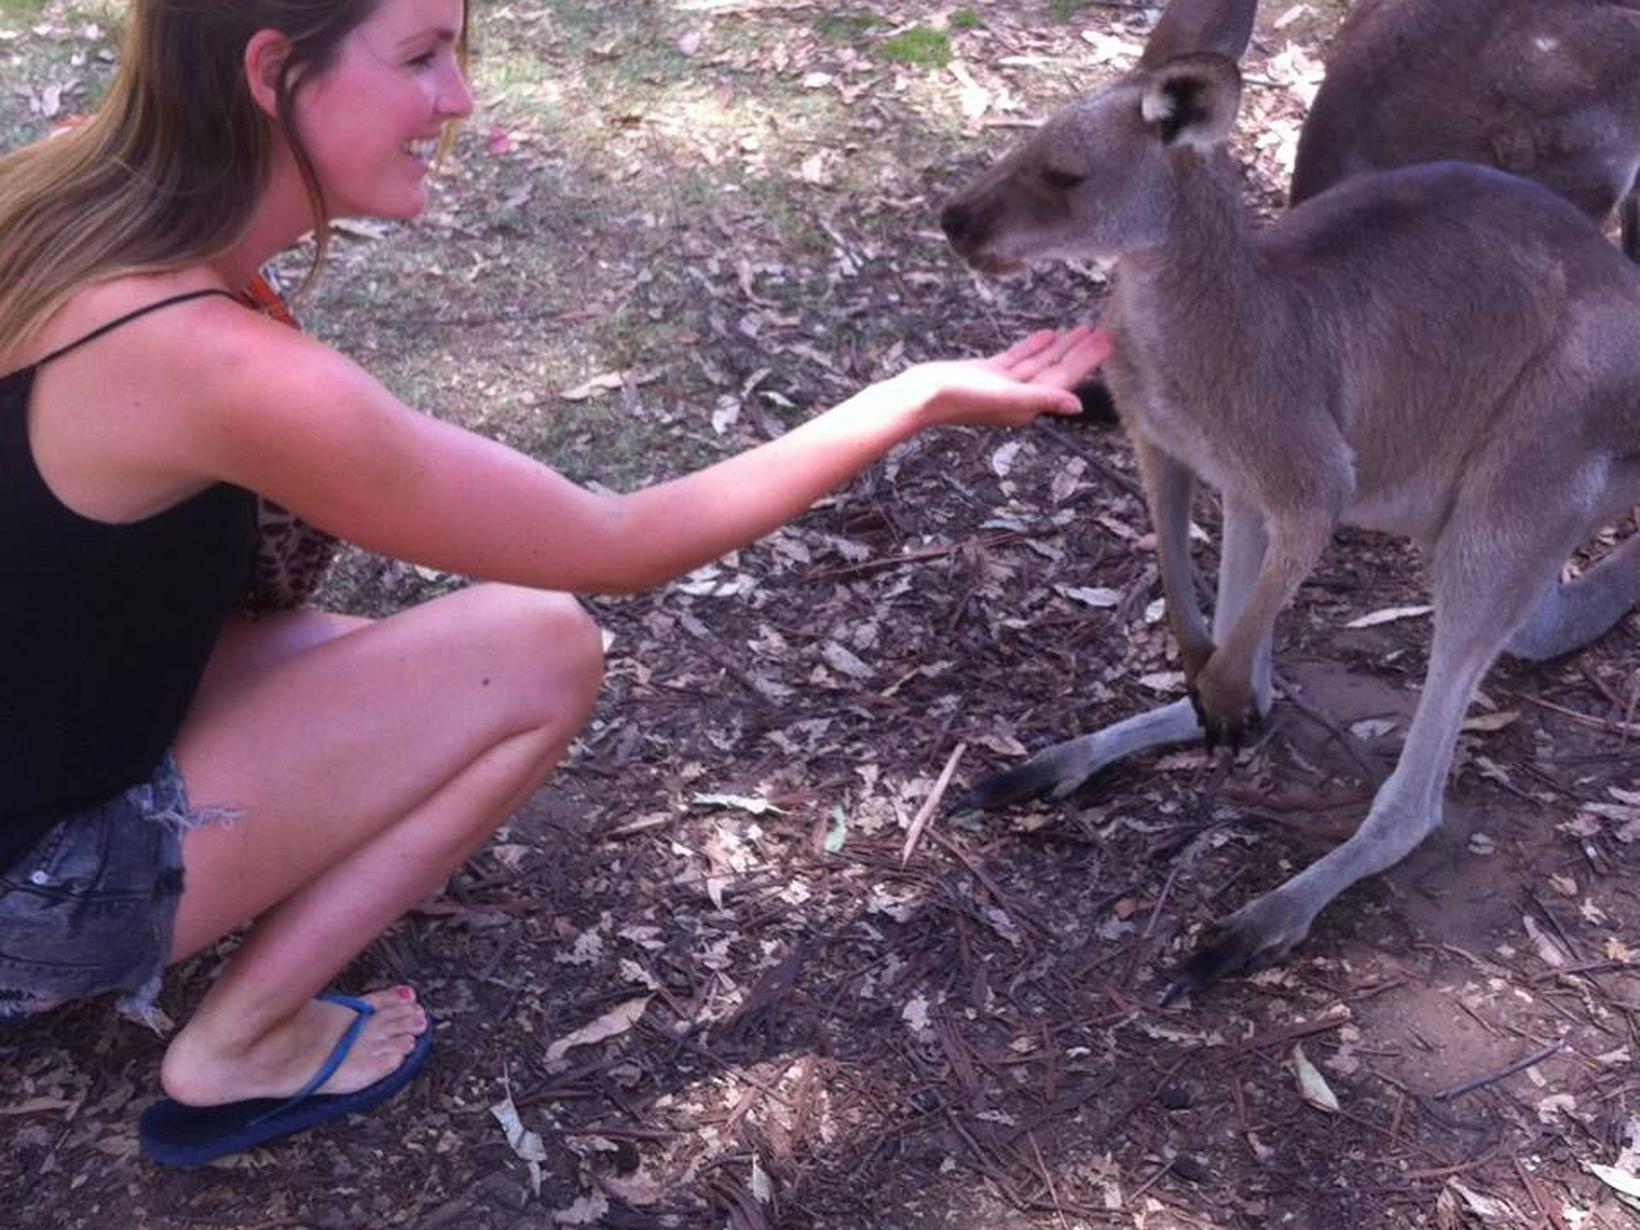 Janneke from Broome, Western Australia, Australia